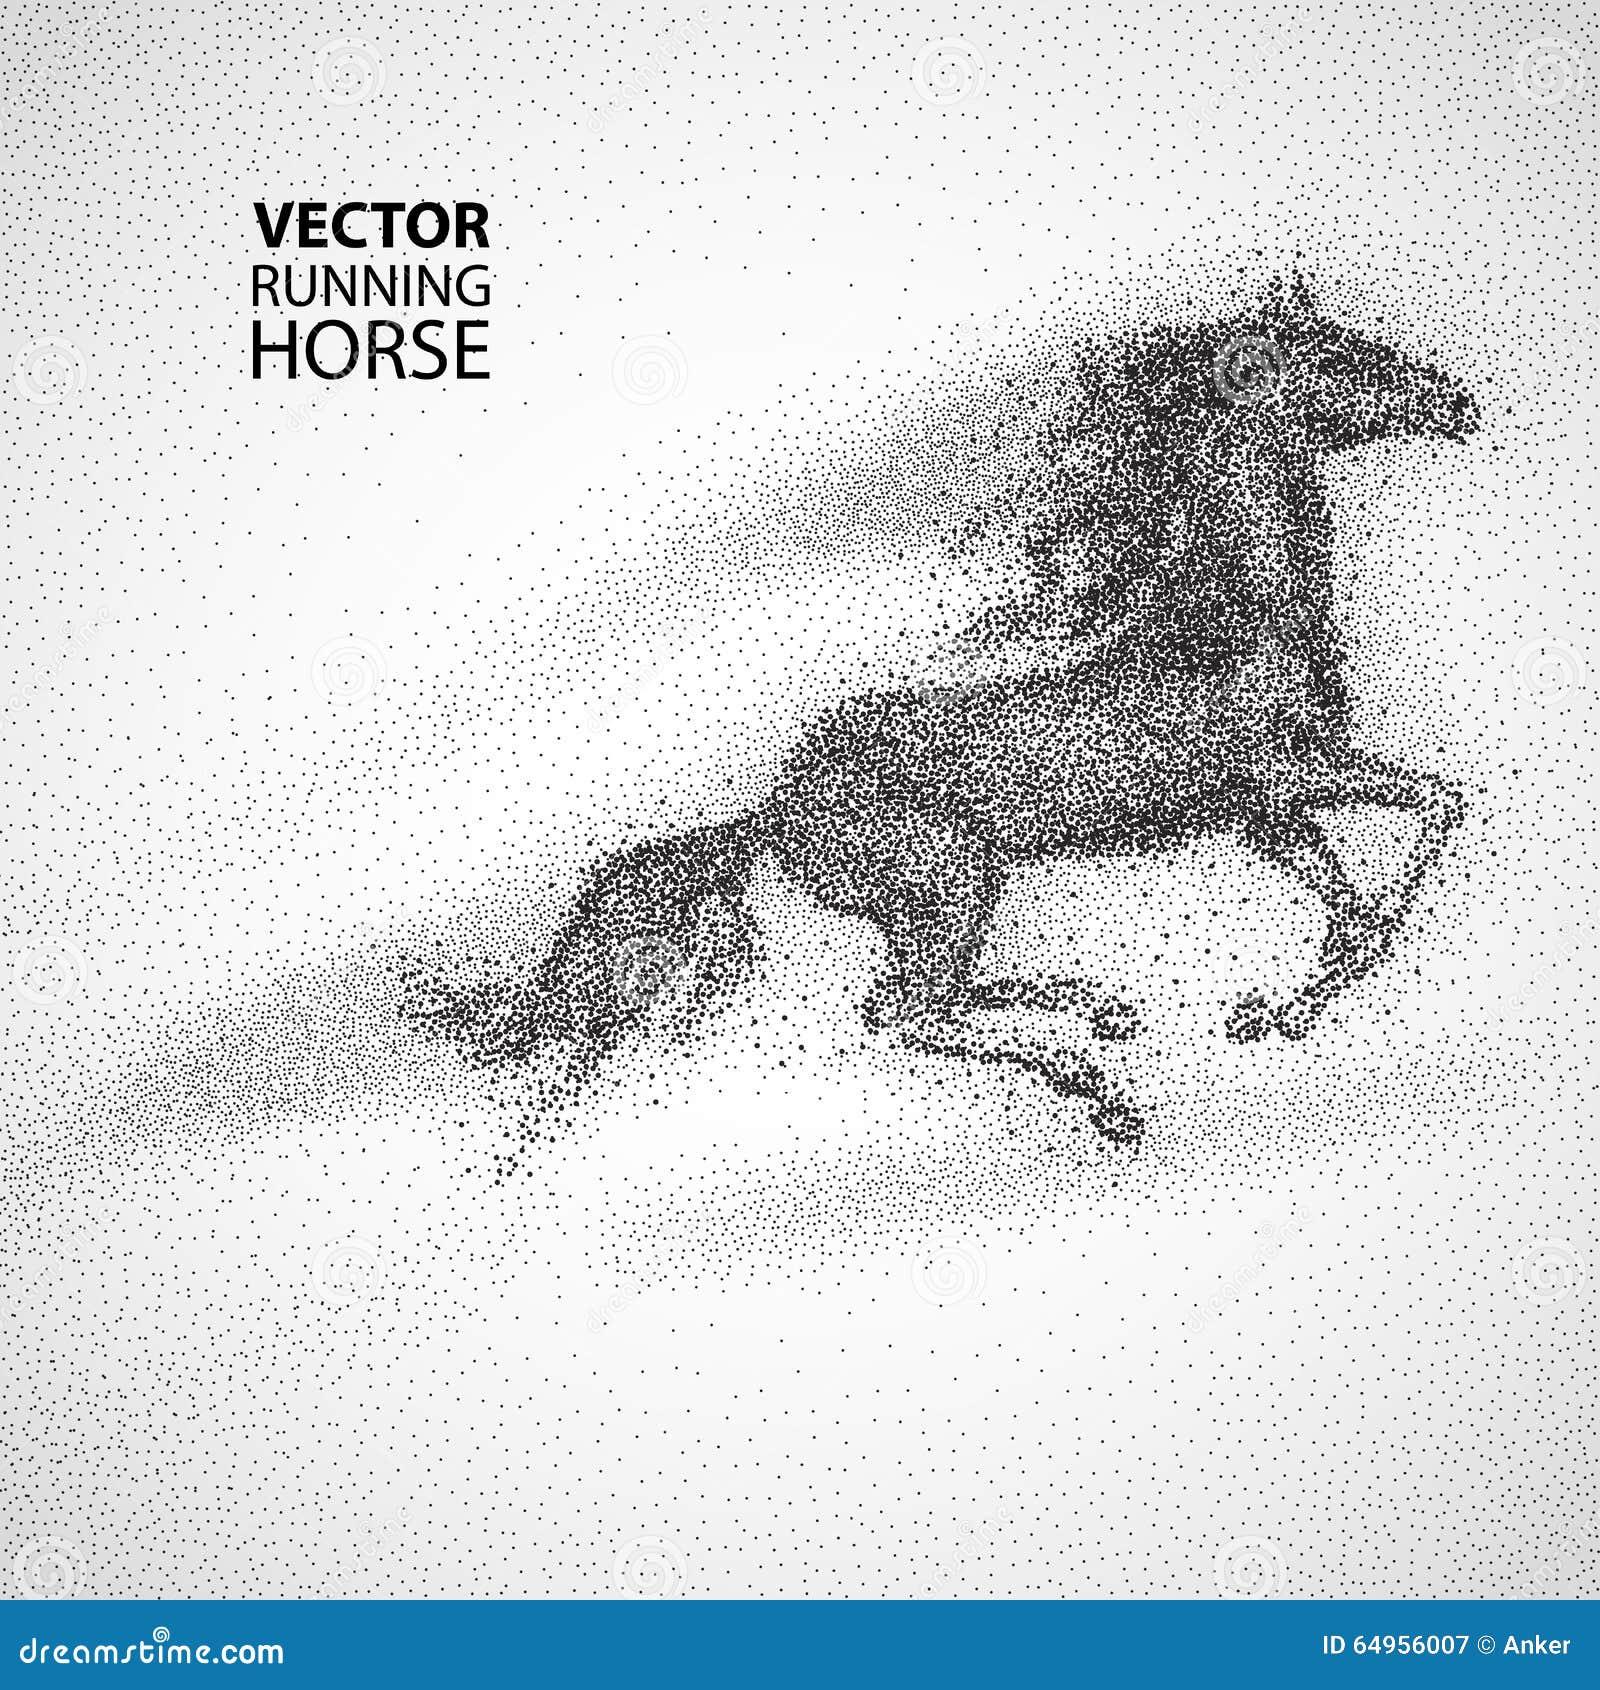 running horse design